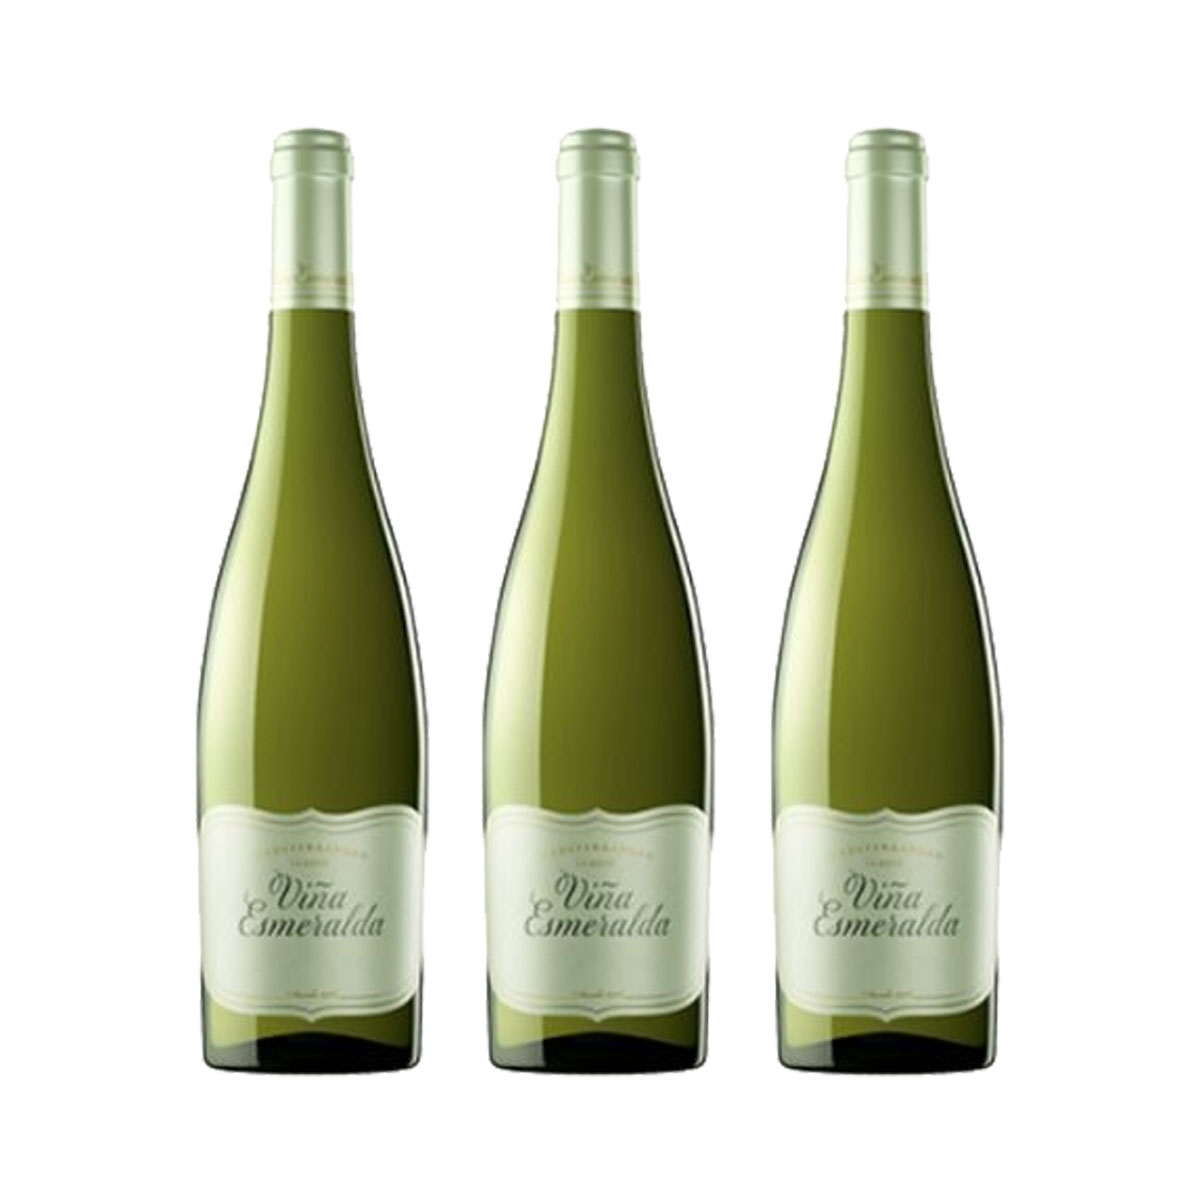 Kit 3x Vinho Branco Espanhol Torres Esmeralda 750ml 2019